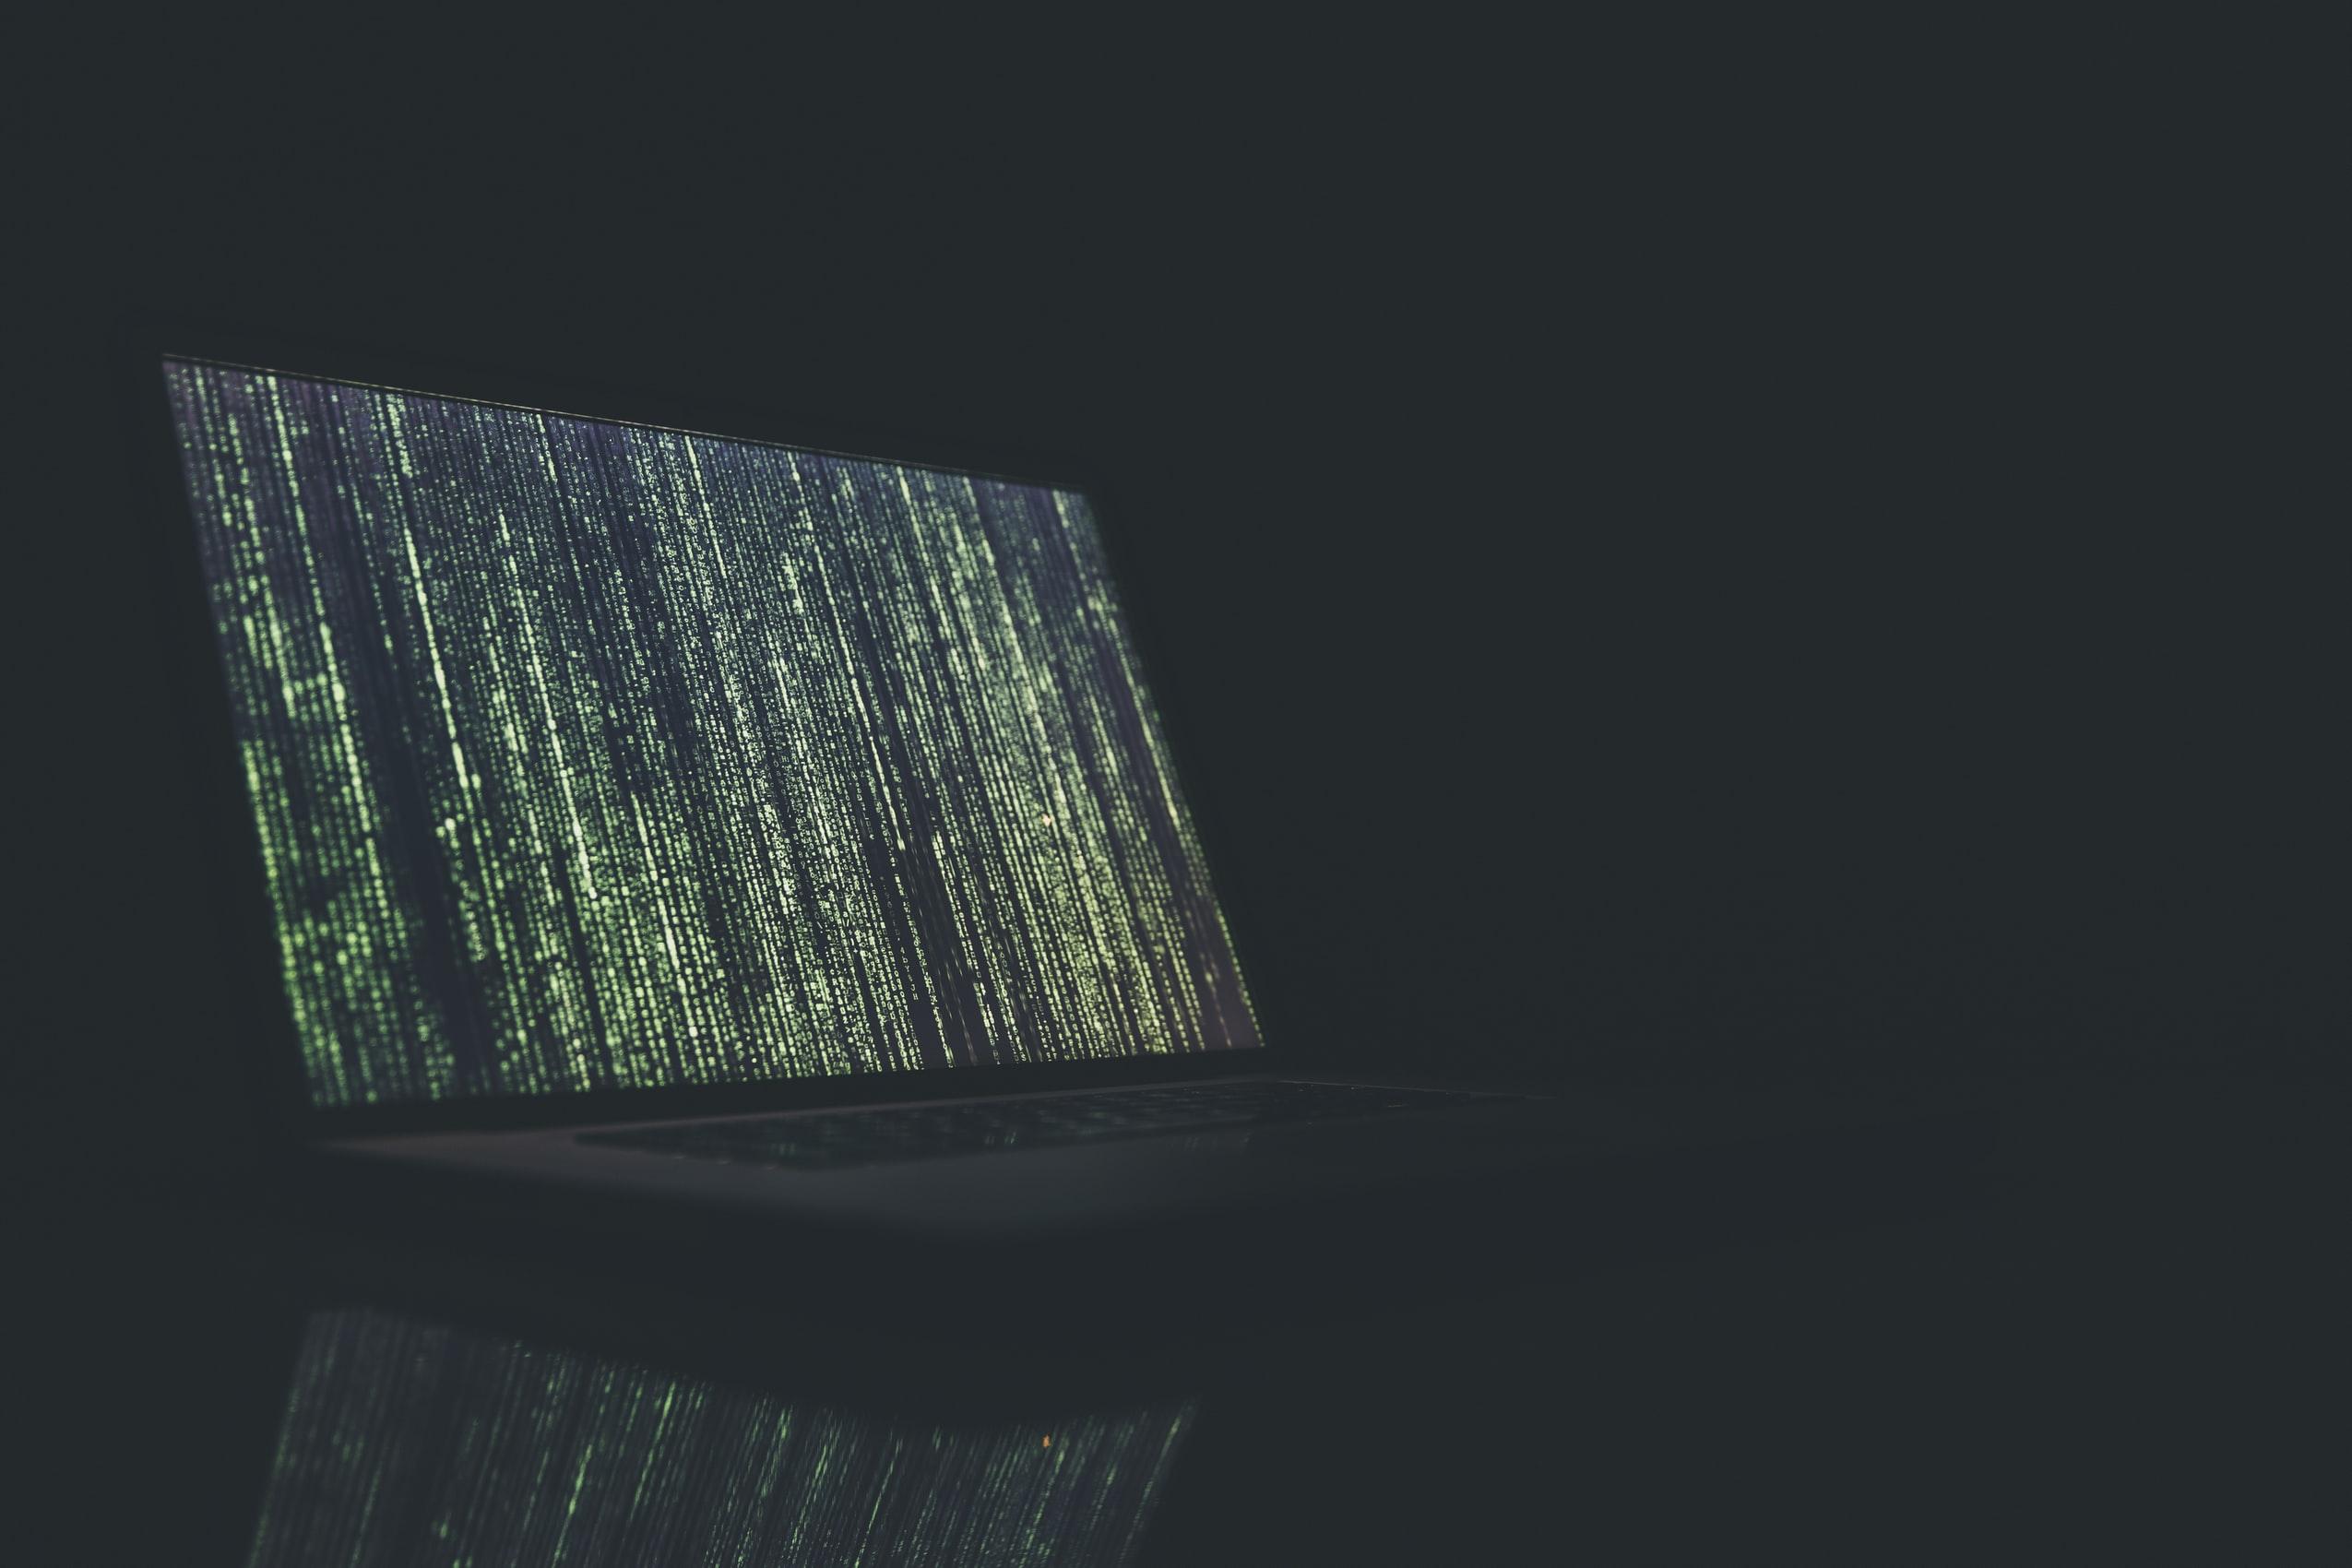 Top Internet Security Threats